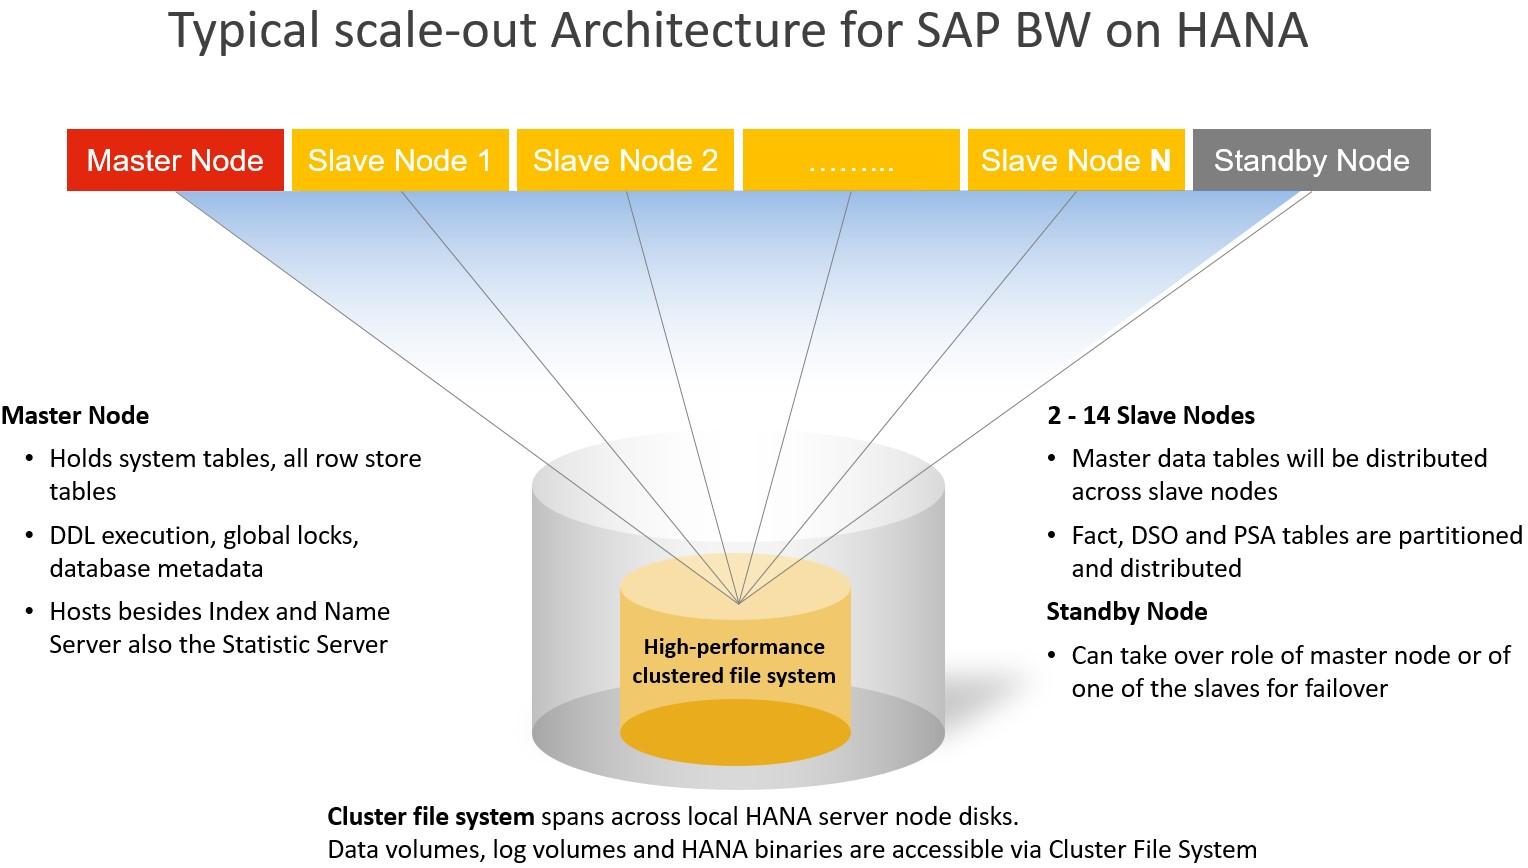 sap bw on hana sap hana tutorials and materials sap hana certifications sap [ 1528 x 868 Pixel ]